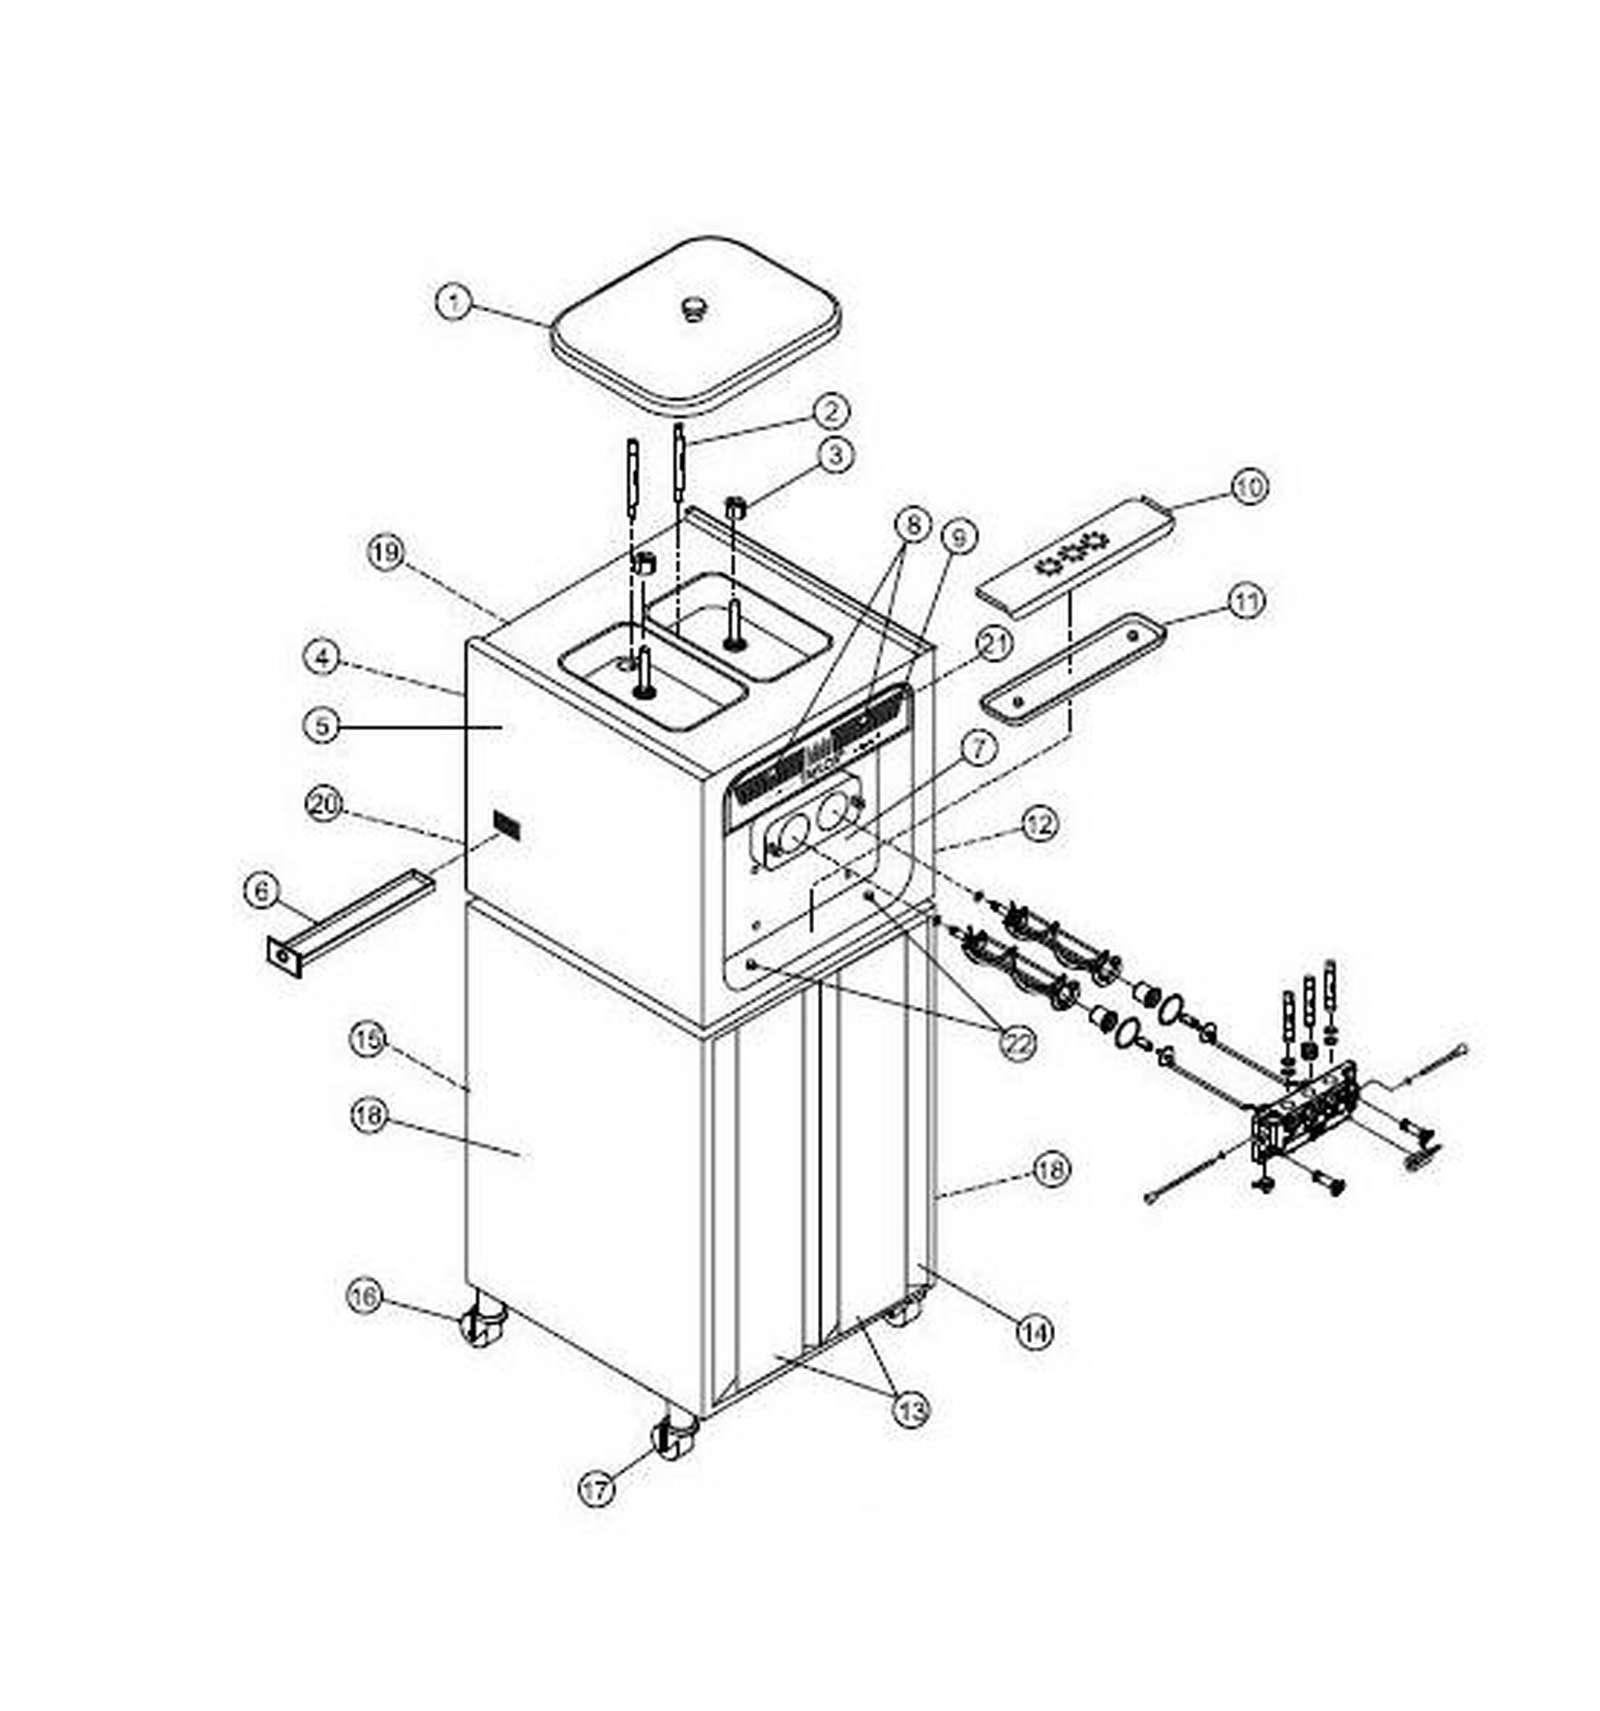 Krystal Universal Multiflex Frigidaire Electric Dryer Wiring Diagram Parts Ipd 6190 195709